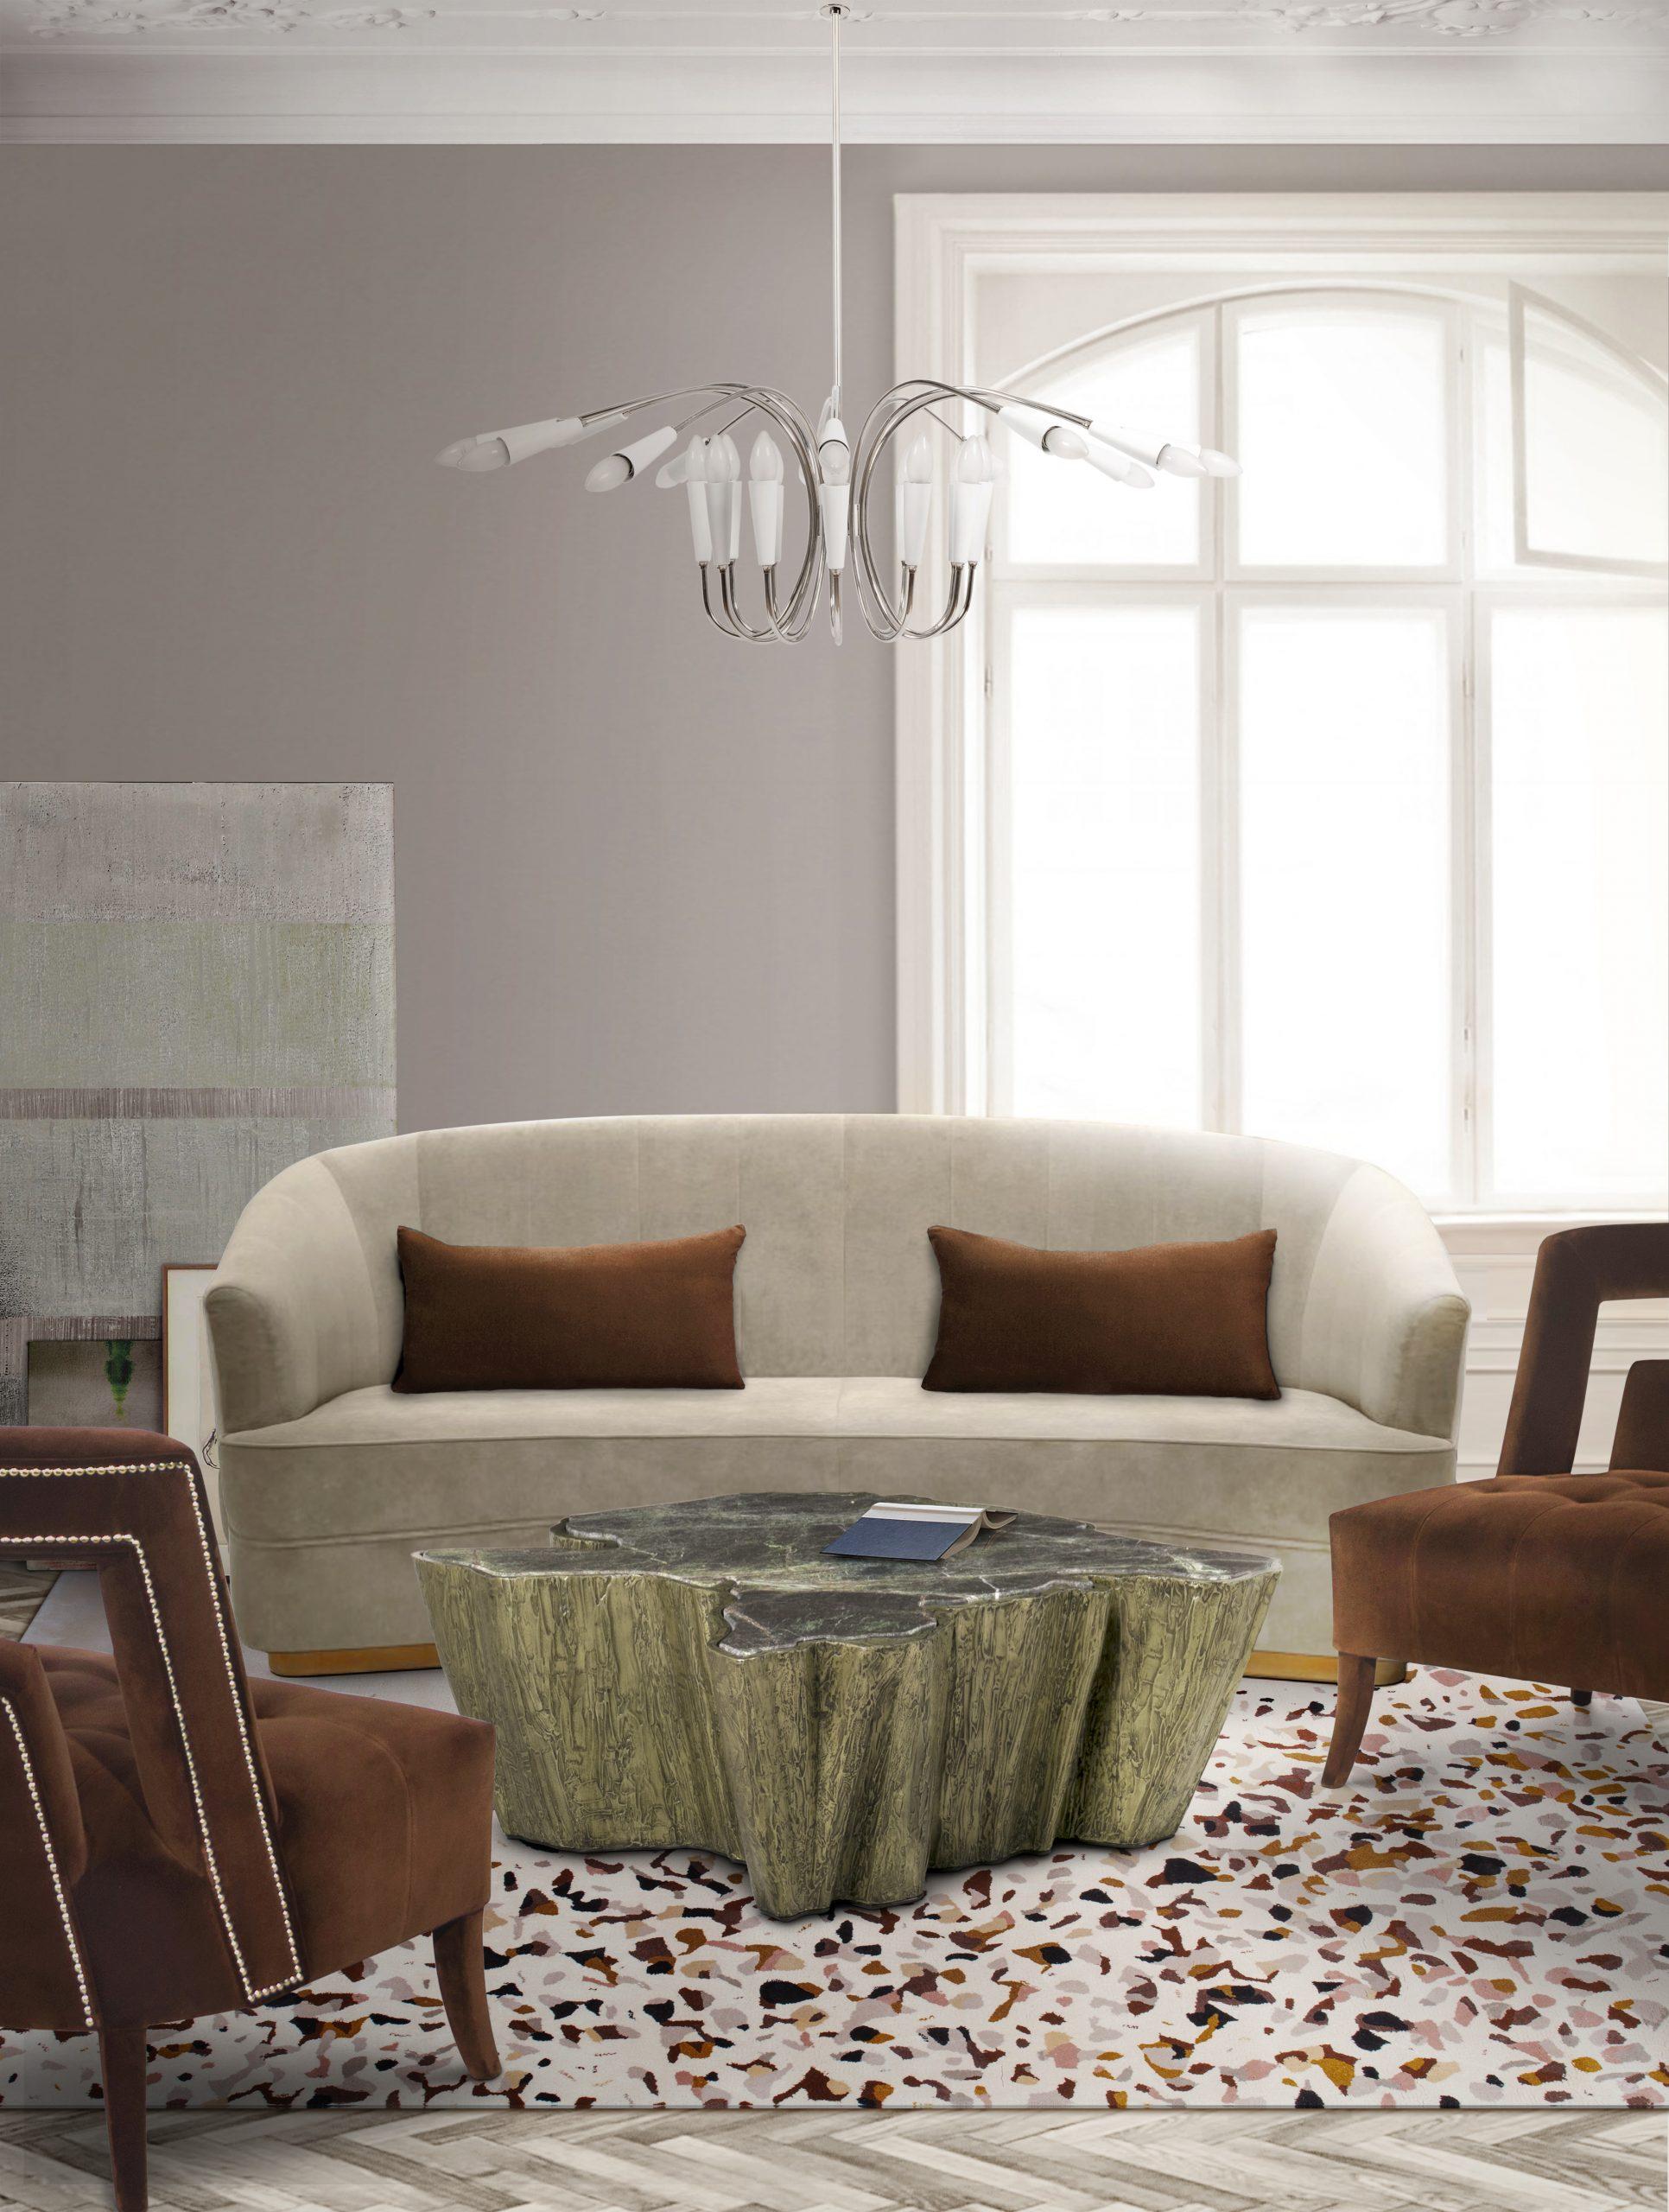 5 Winter Interior Design Trends That Are Far From Boring And Plain! winter interior design 5 Winter Interior Design Trends That Are Far From Boring And Plain! 4 2 scaled